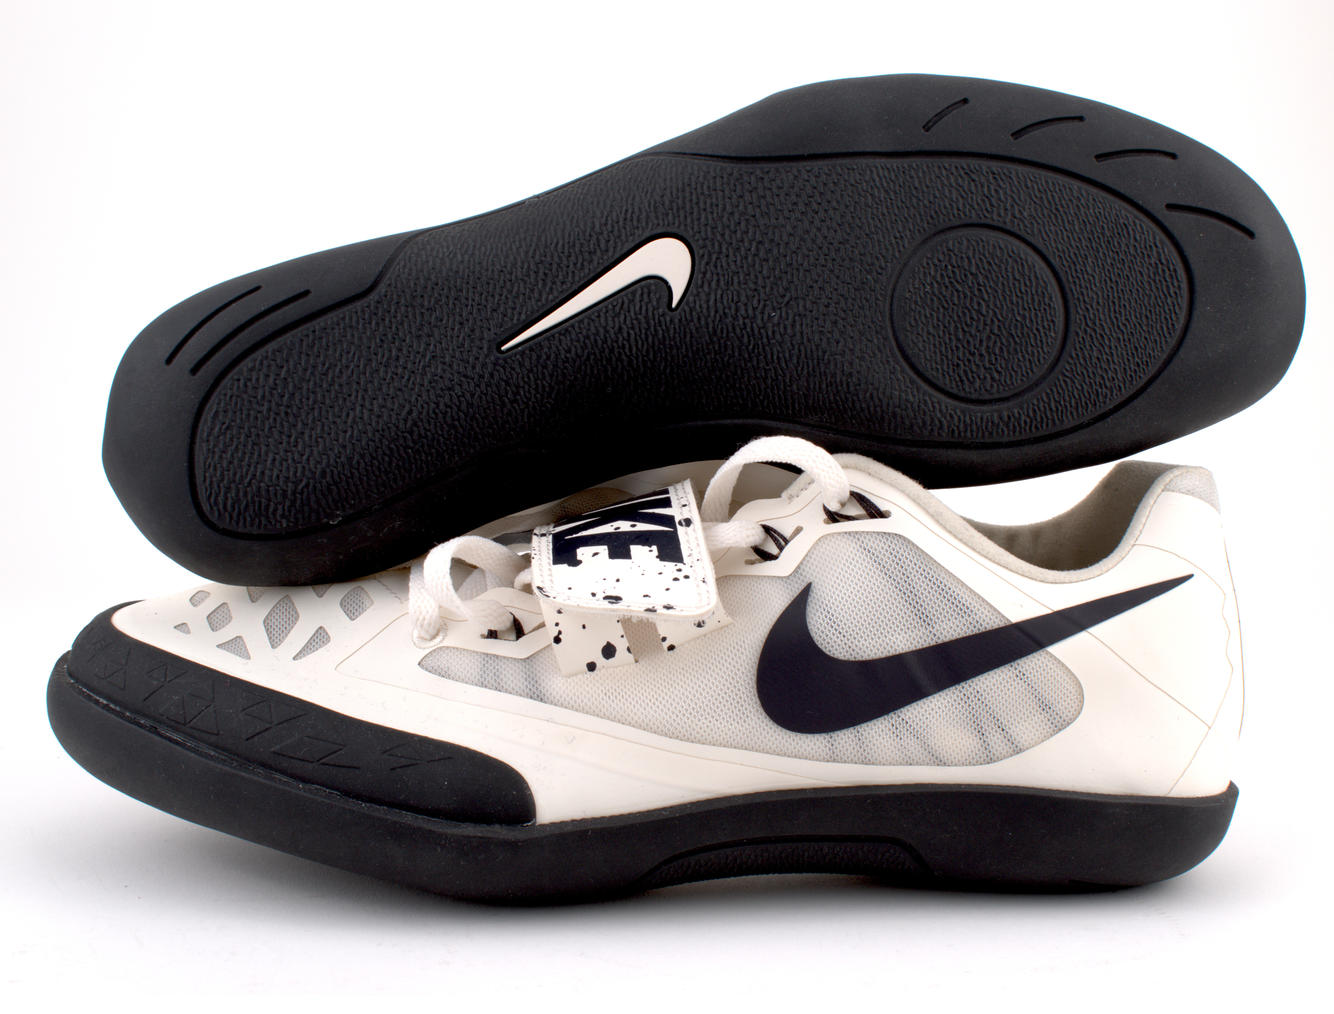 Nike Zoom SD 4 Track \u0026 Field Shot Put